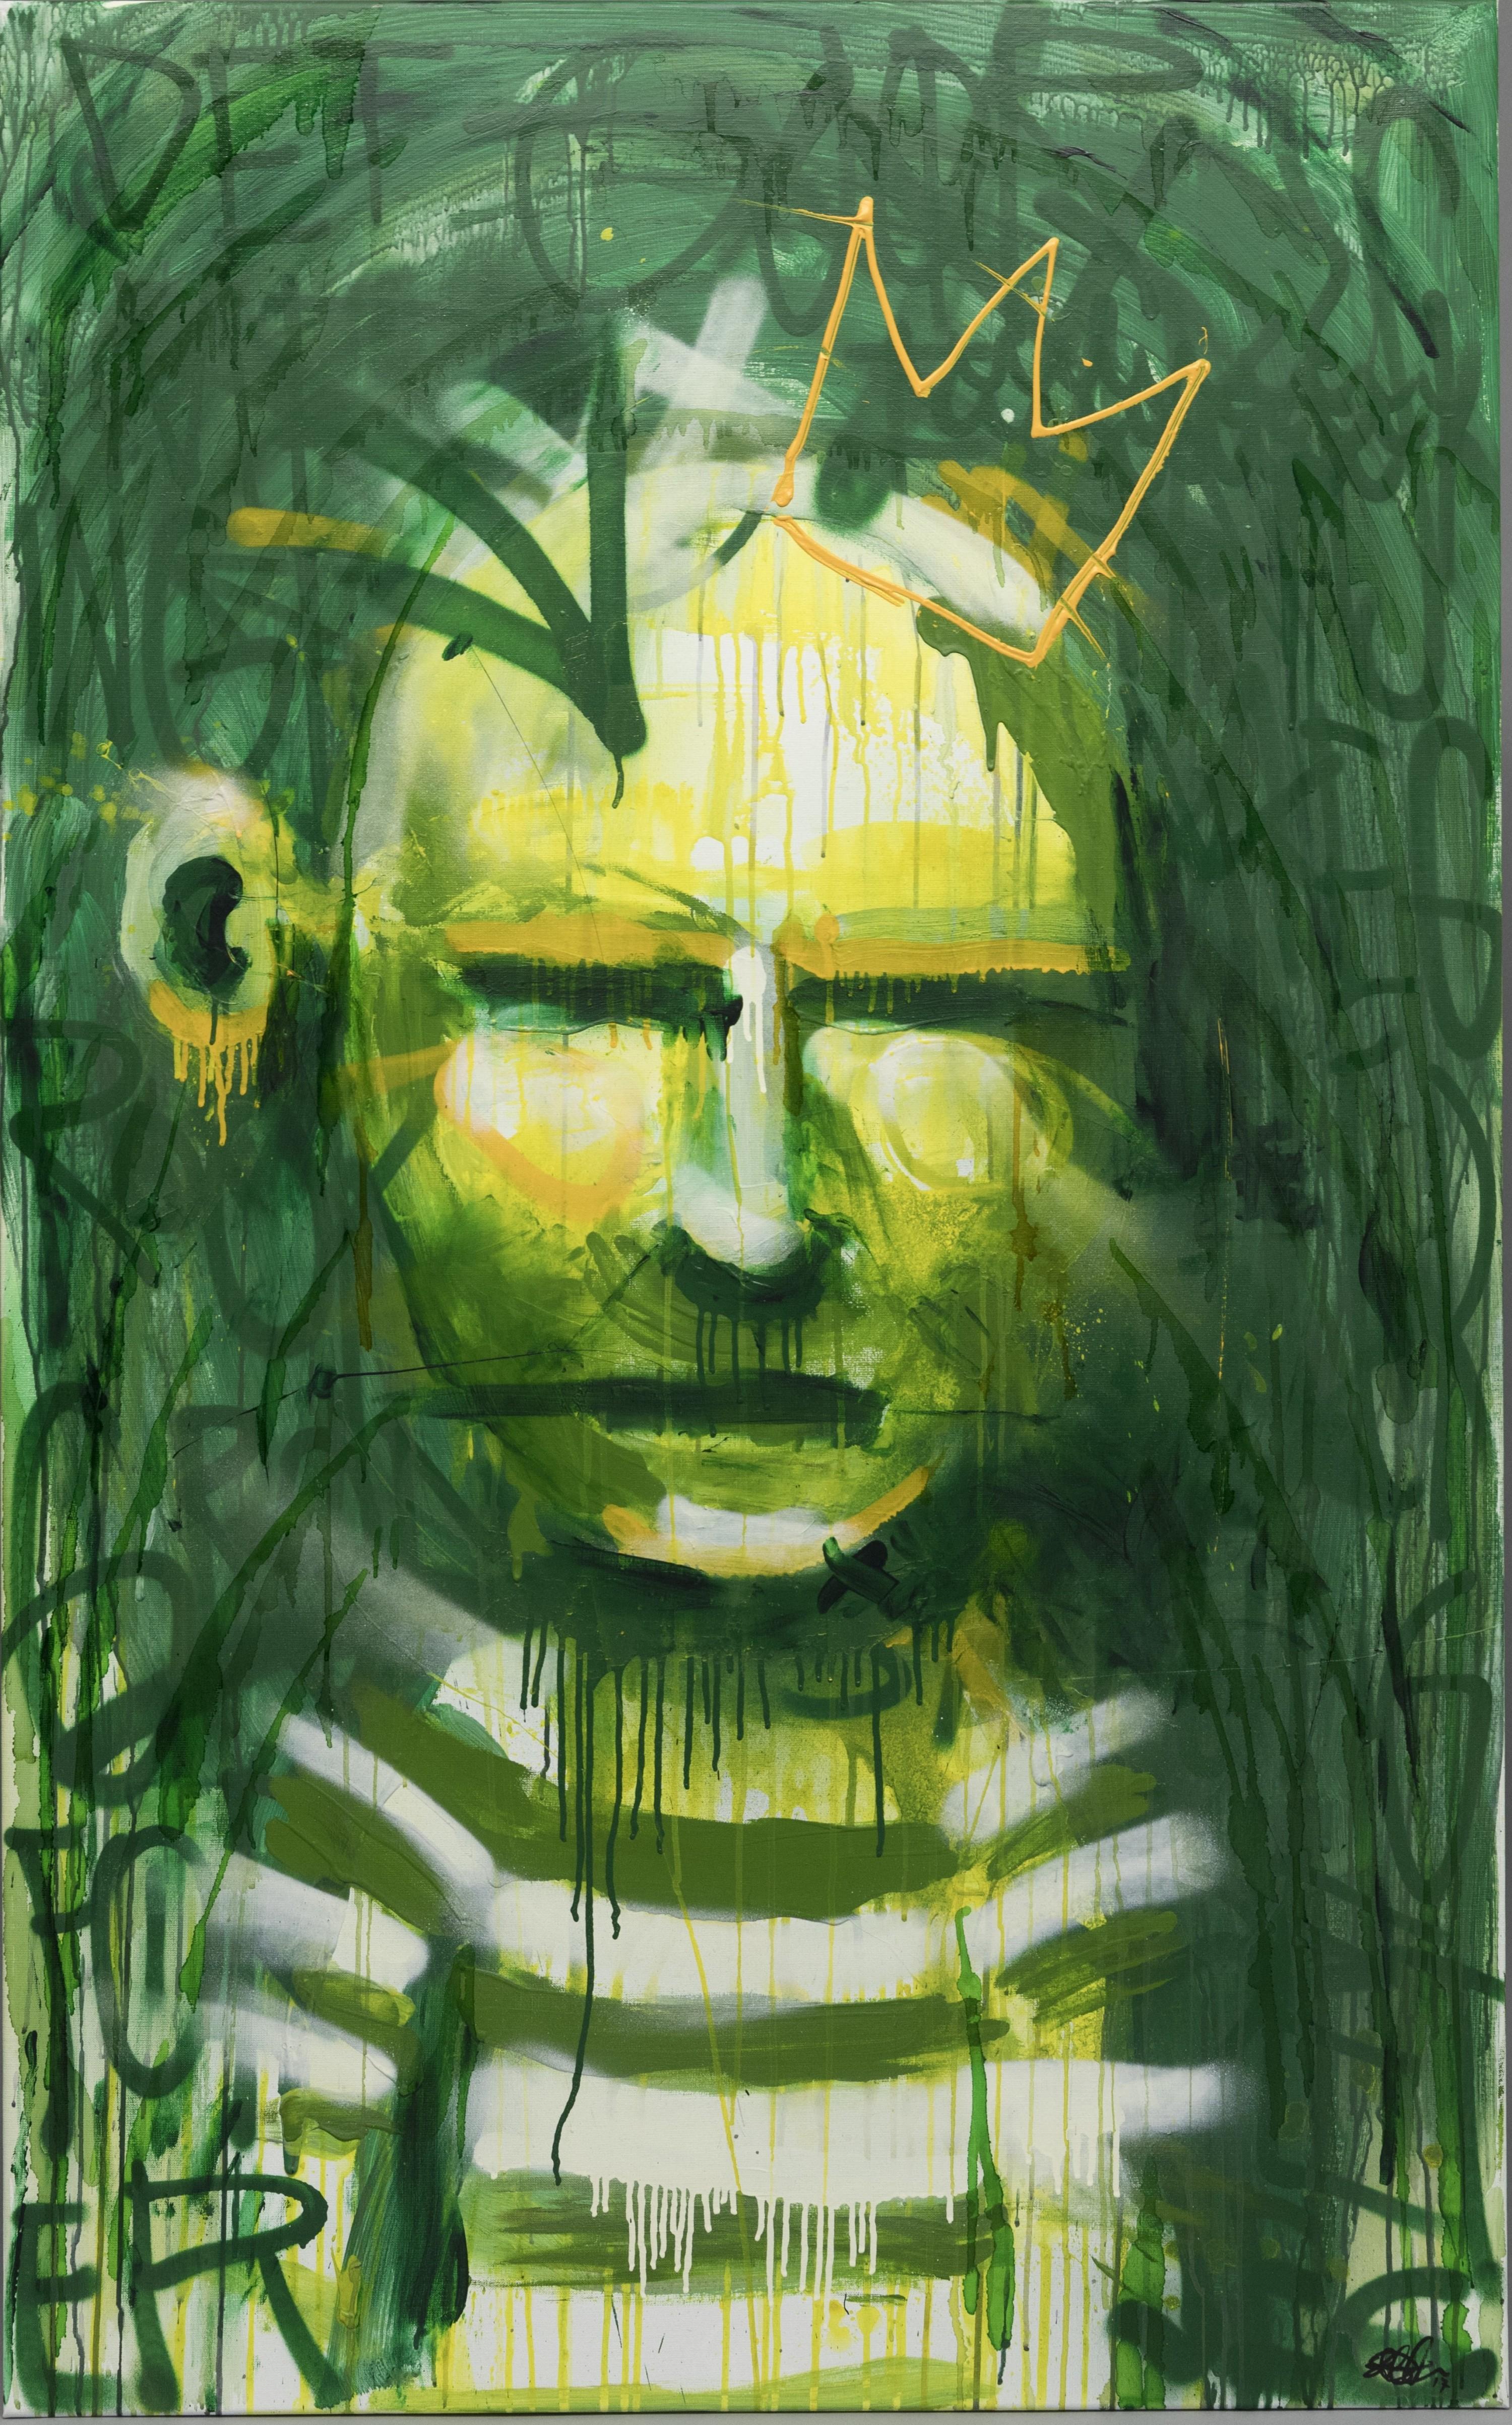 Visual Artwork: Arv by artist and creator Ståle Gerhardsen